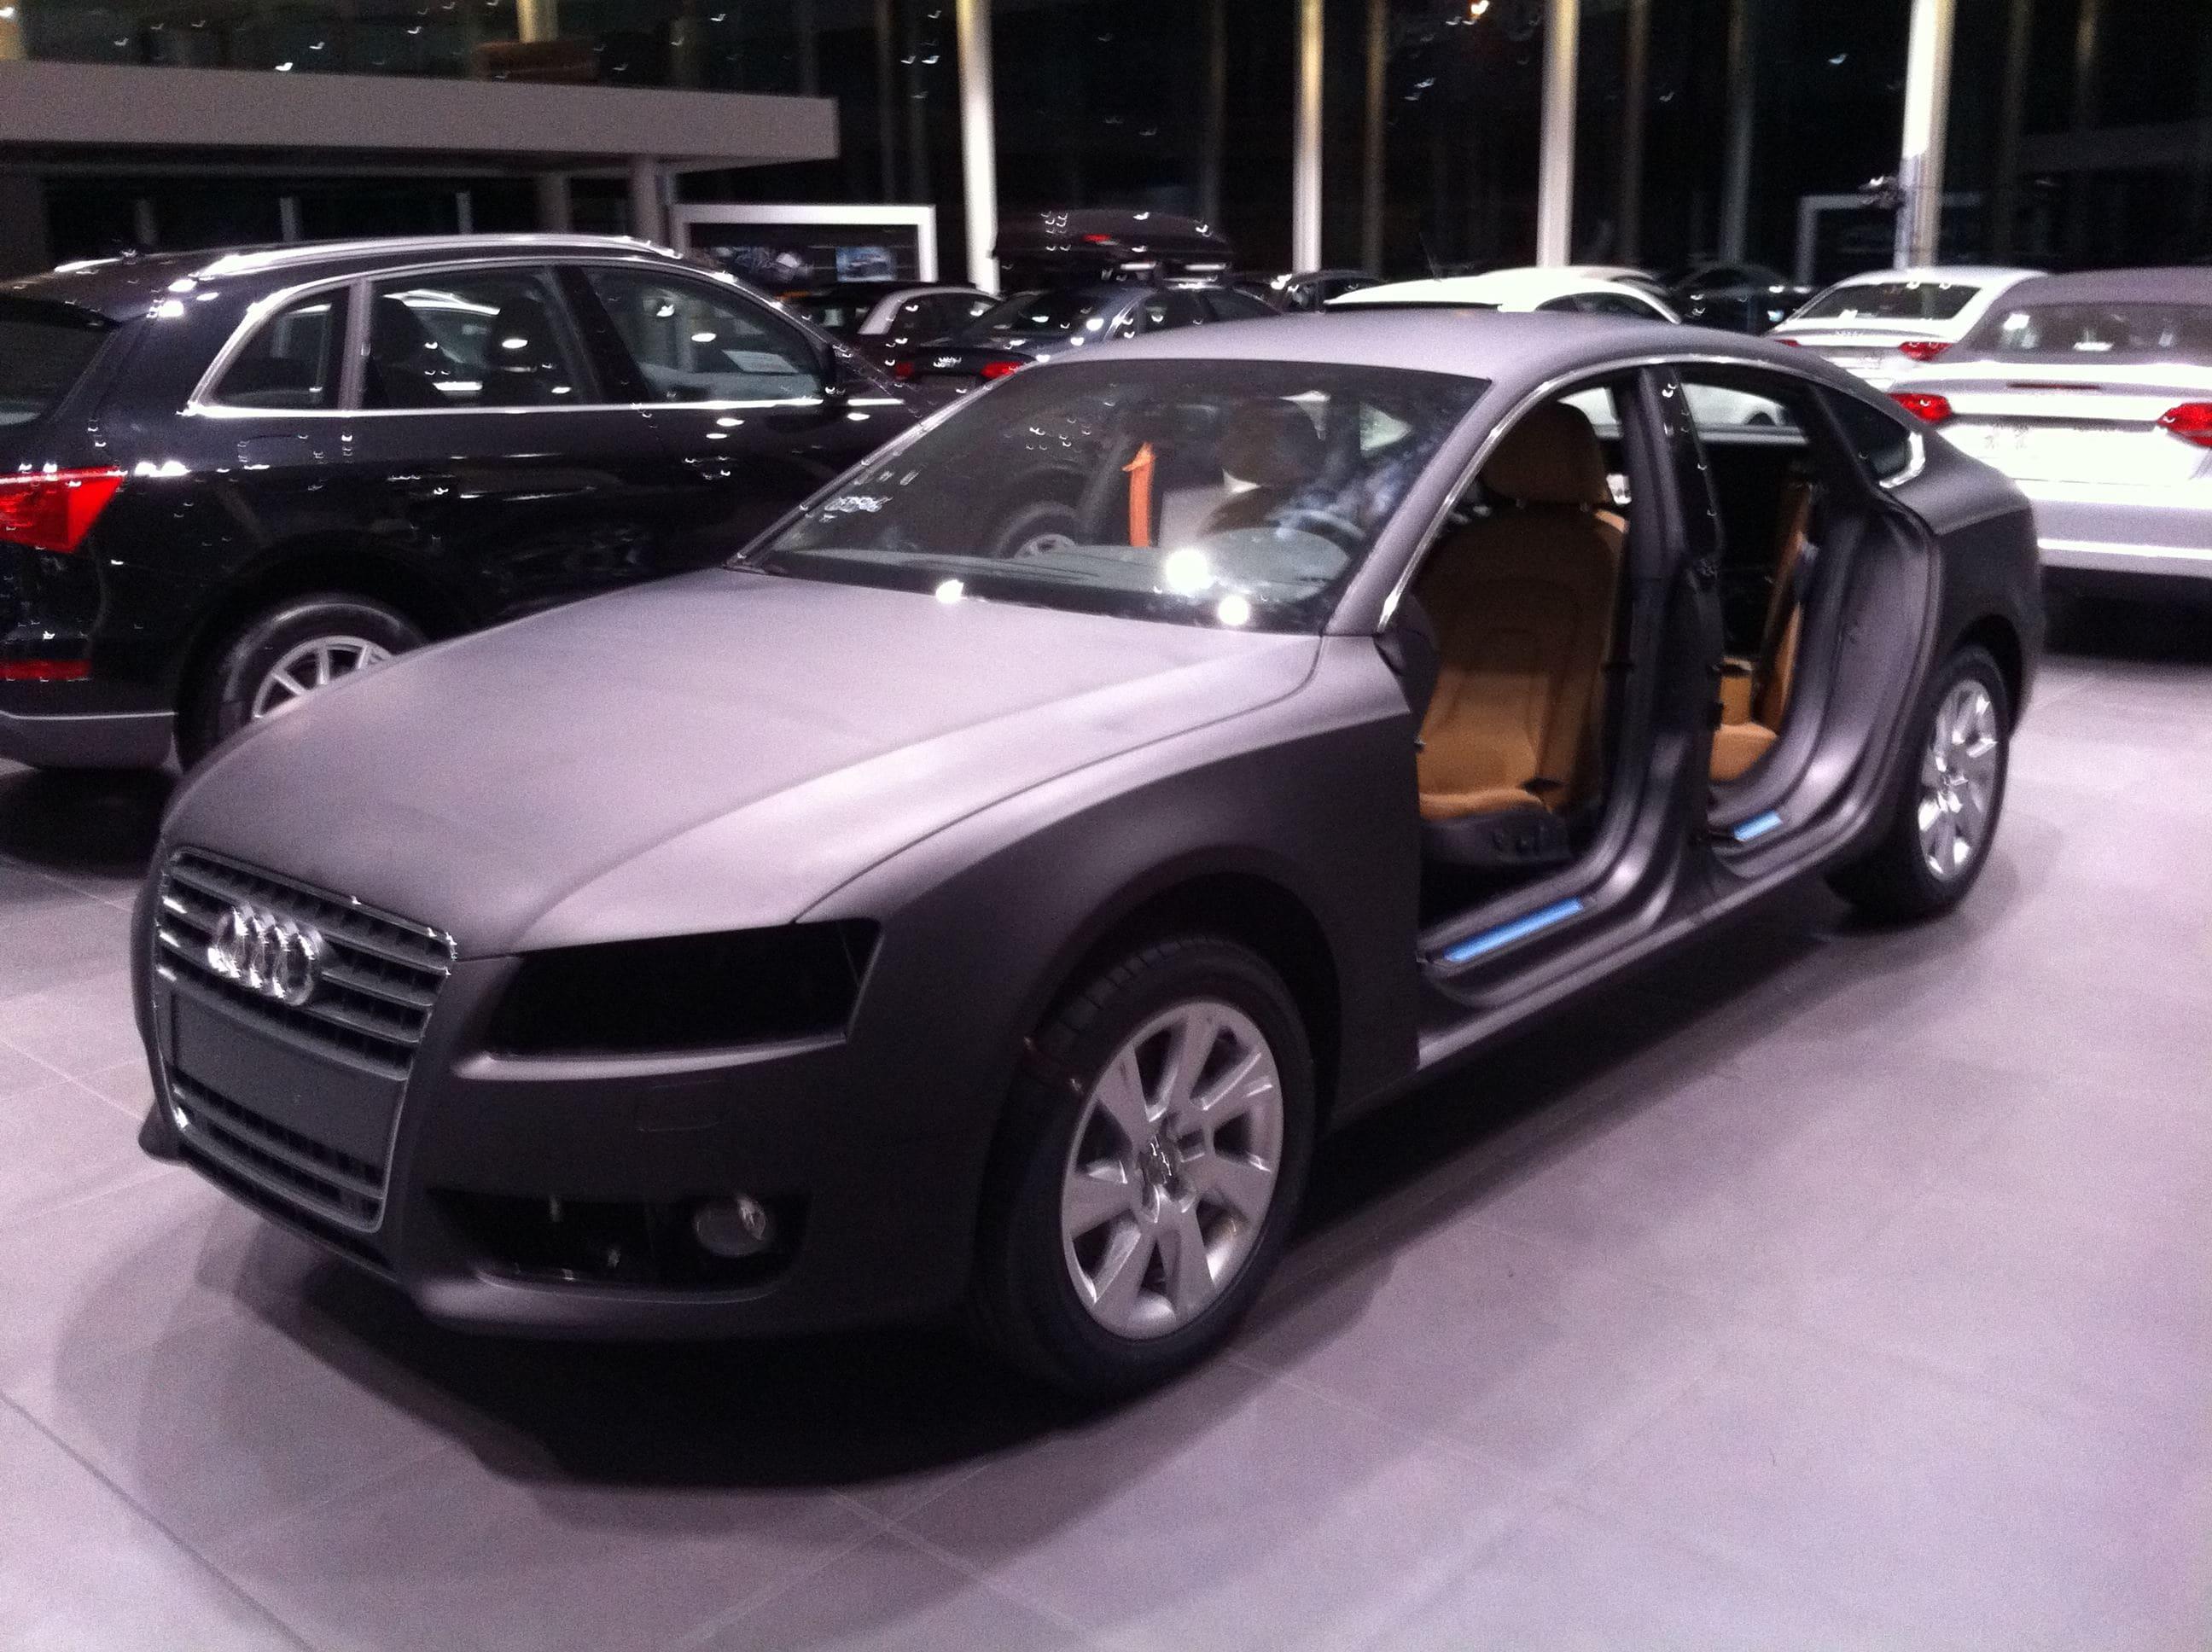 Audi A5 Sportback met Mat Grijze Wrap, Carwrapping door Wrapmyride.nu Foto-nr:4784, ©2021